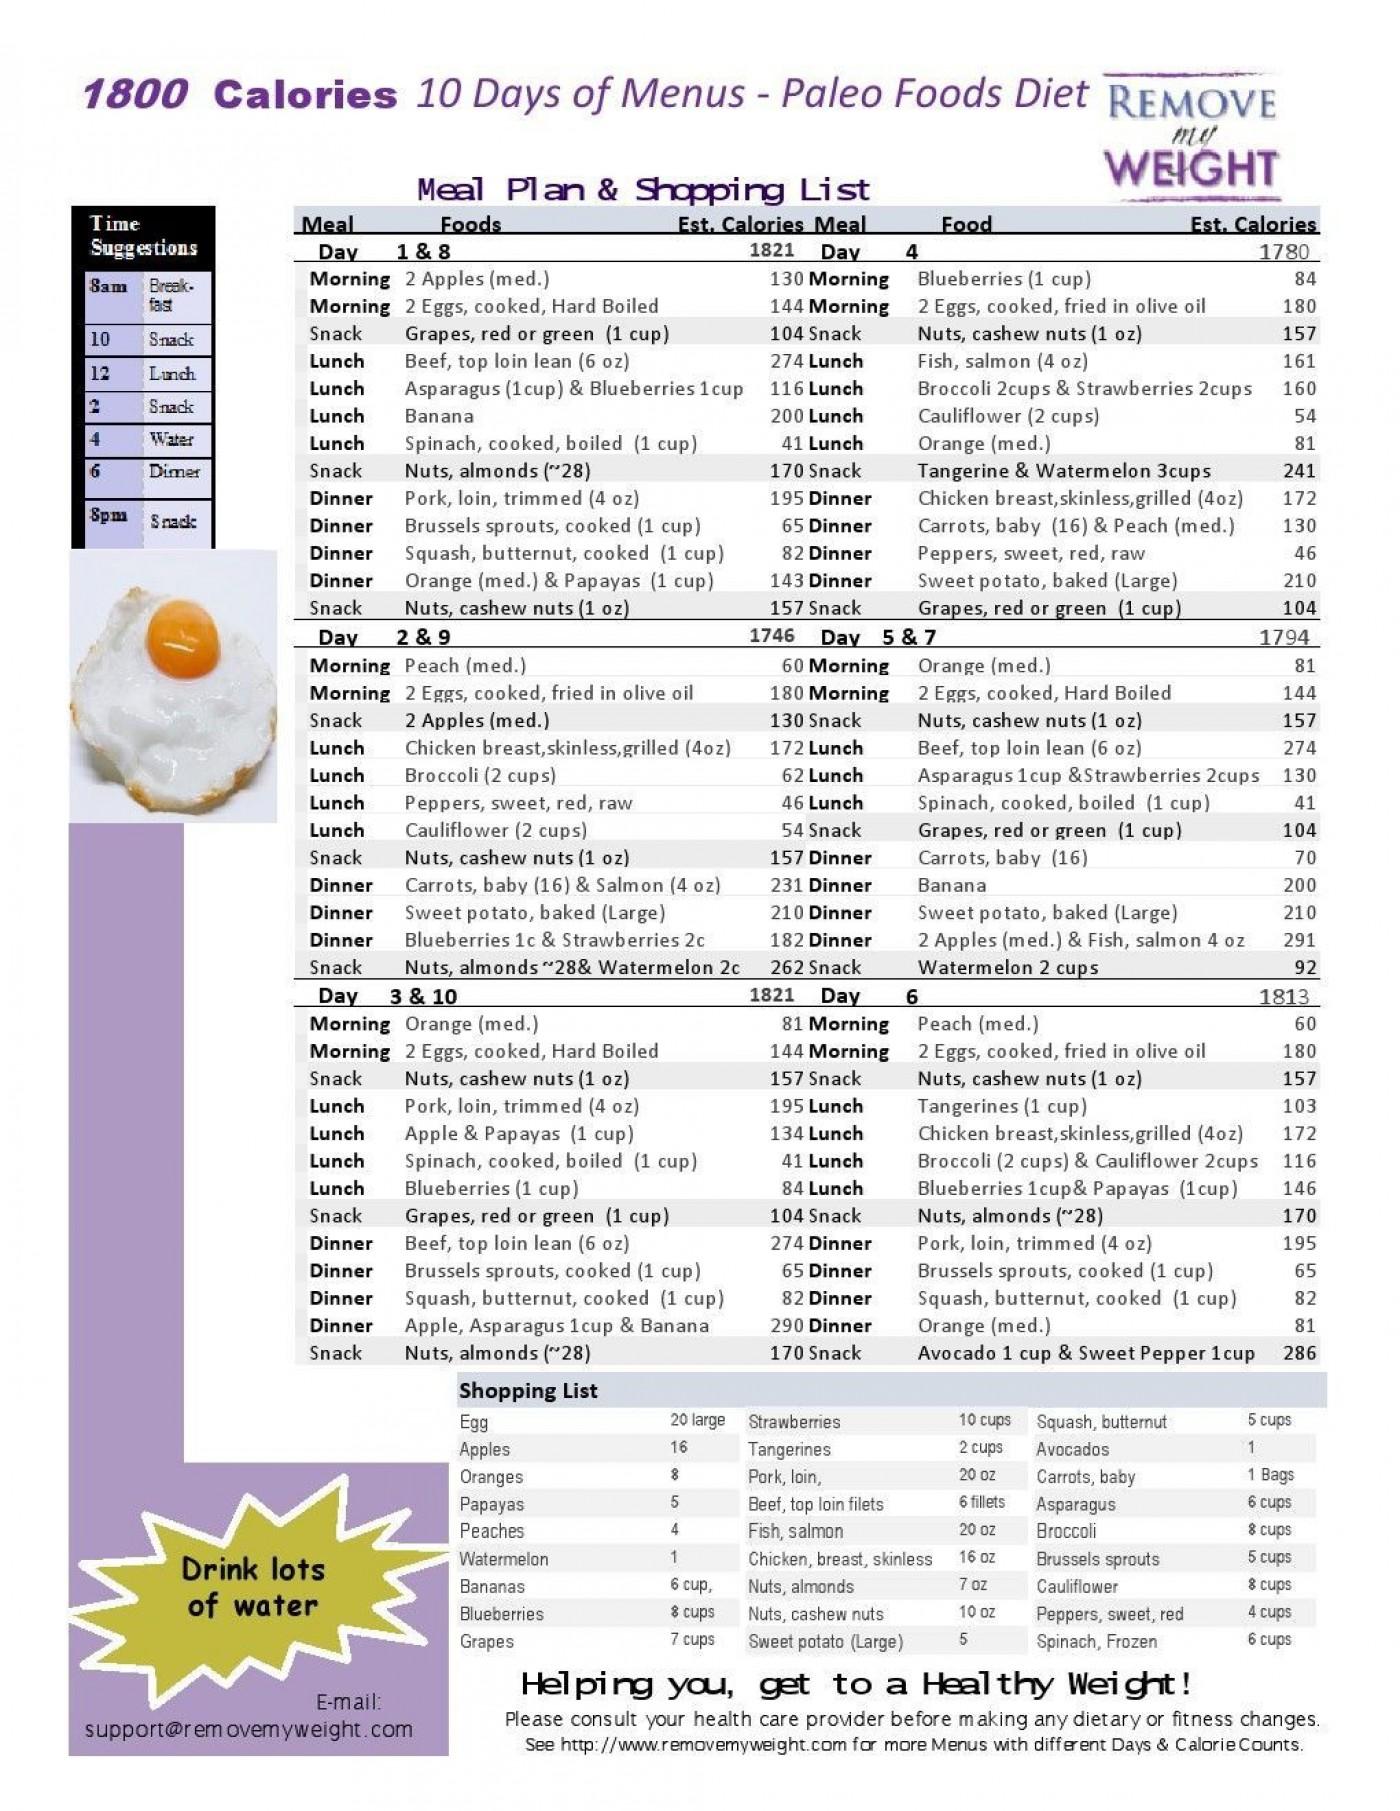 005 Magnificent Sample 1800 Calorie Meal Plan Pdf Photo 1400